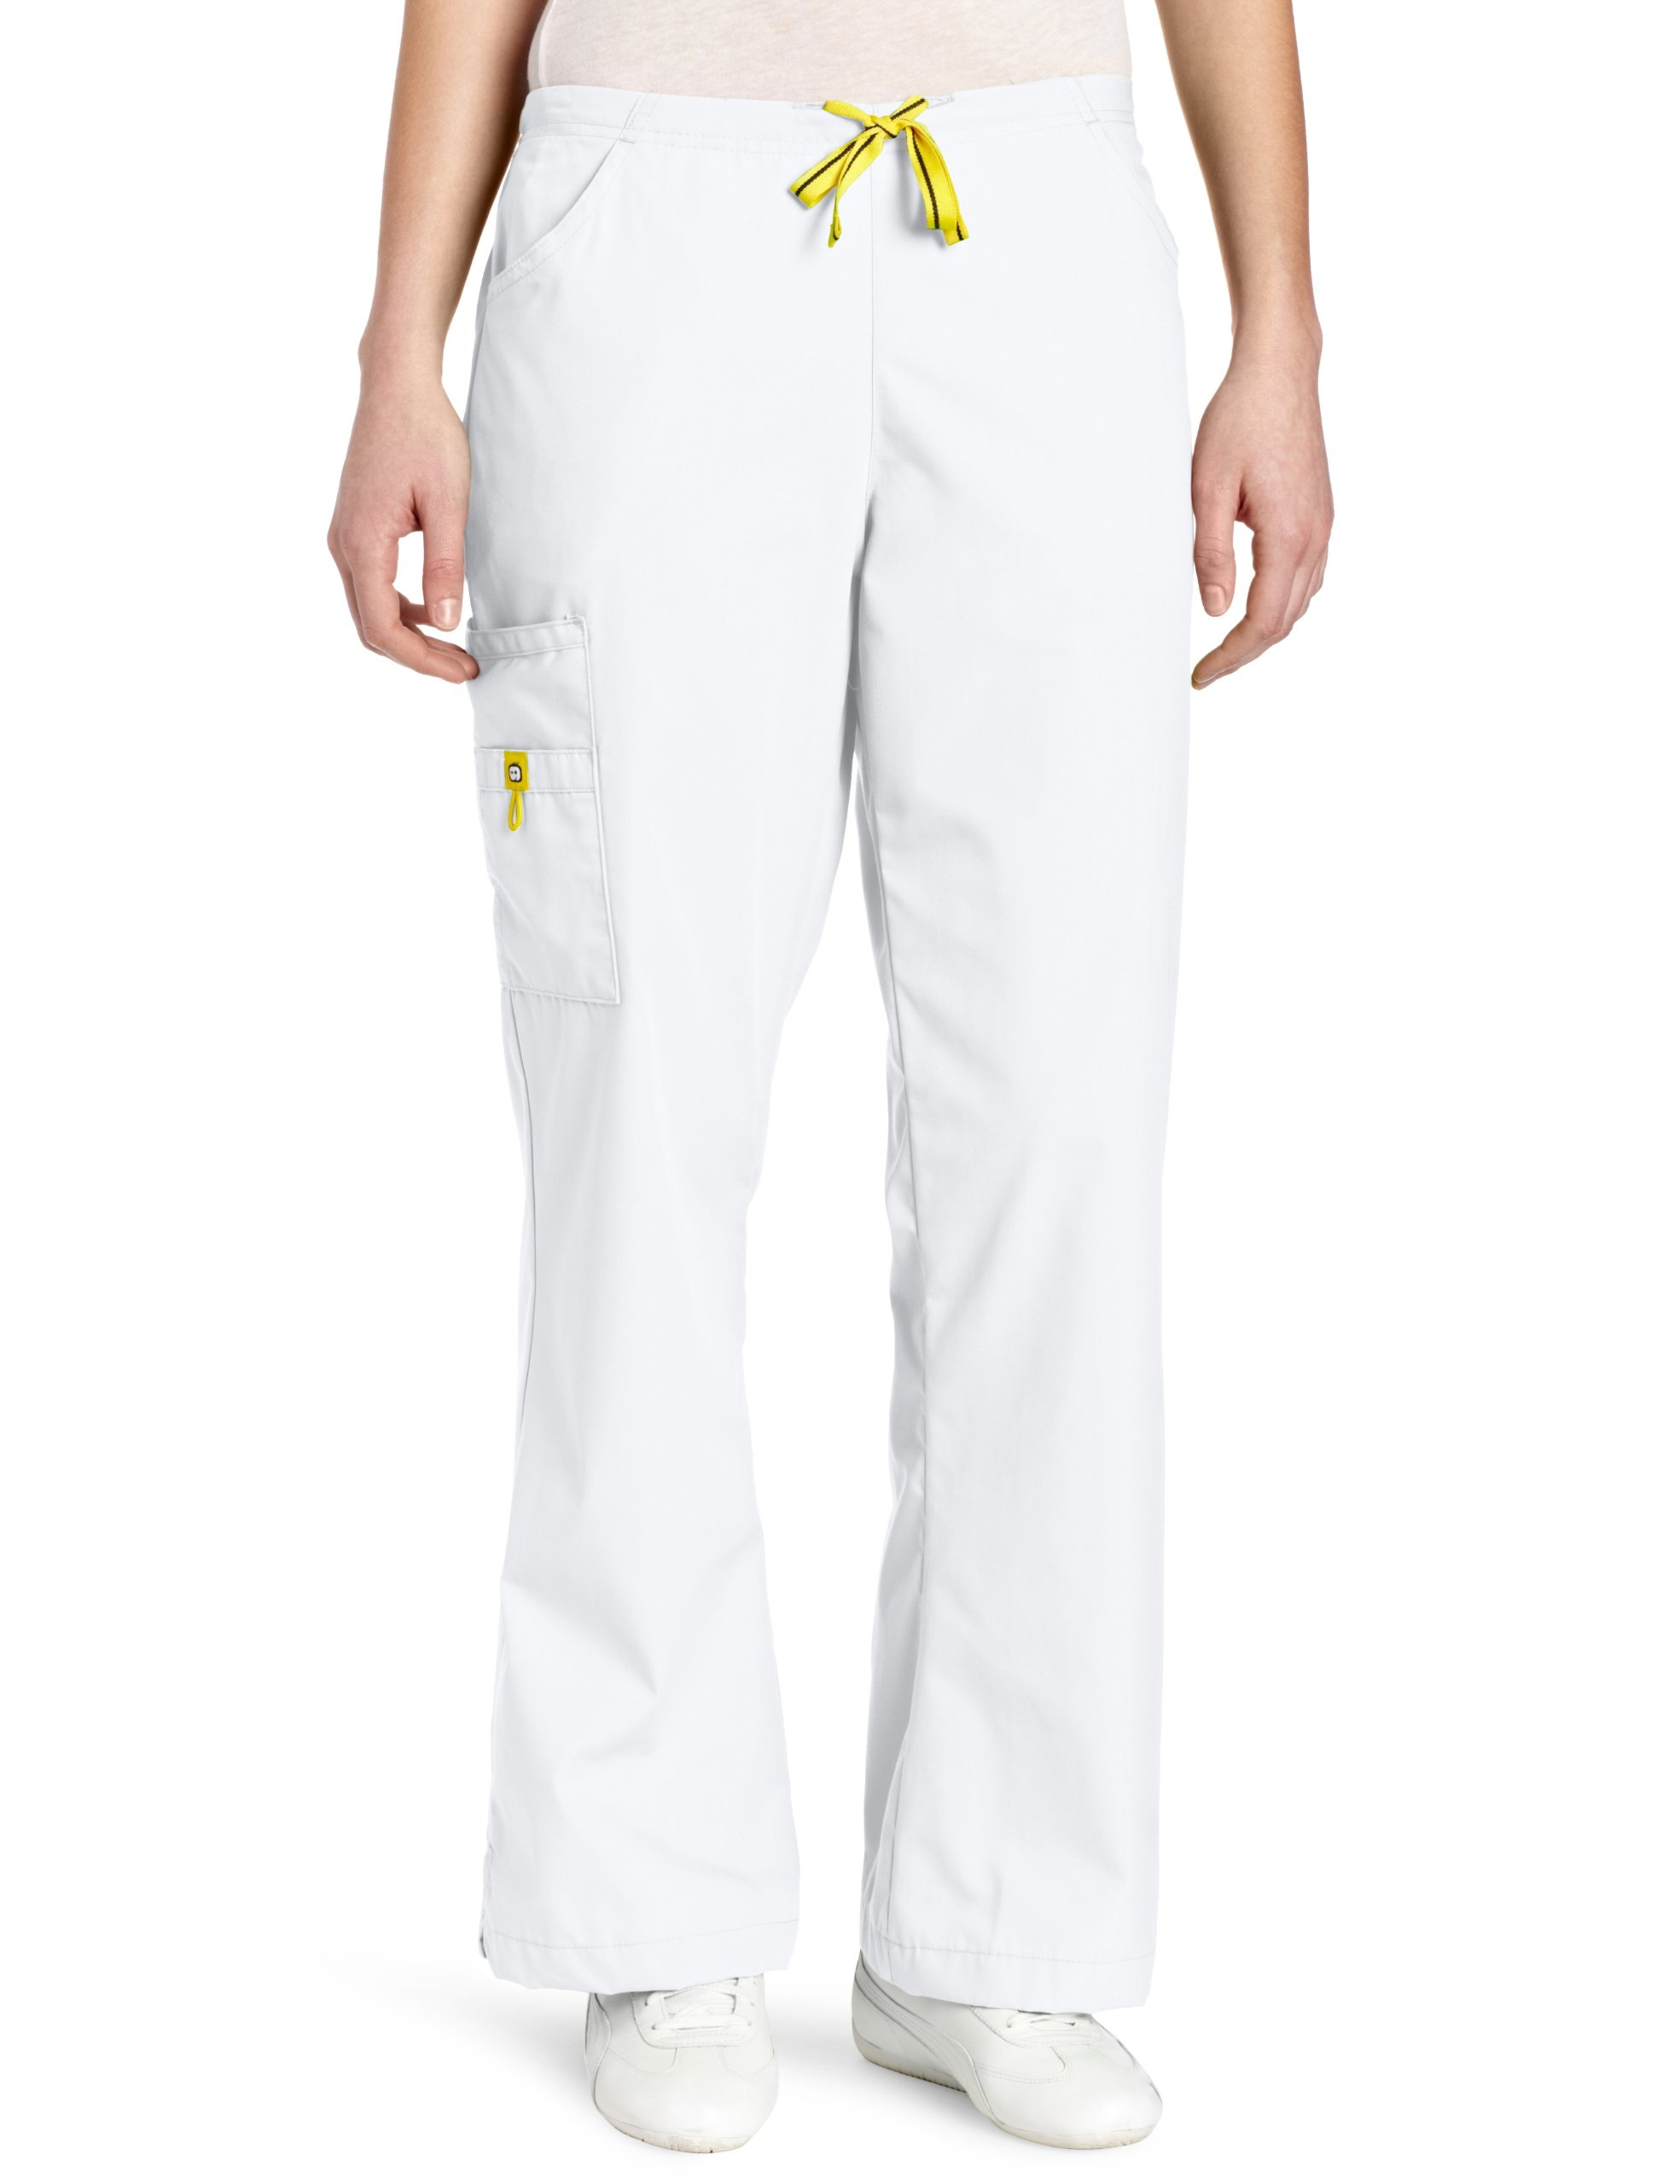 WonderWink Women's Scrubs Romeo 6 Pocket Flare Leg Pant, White, Large